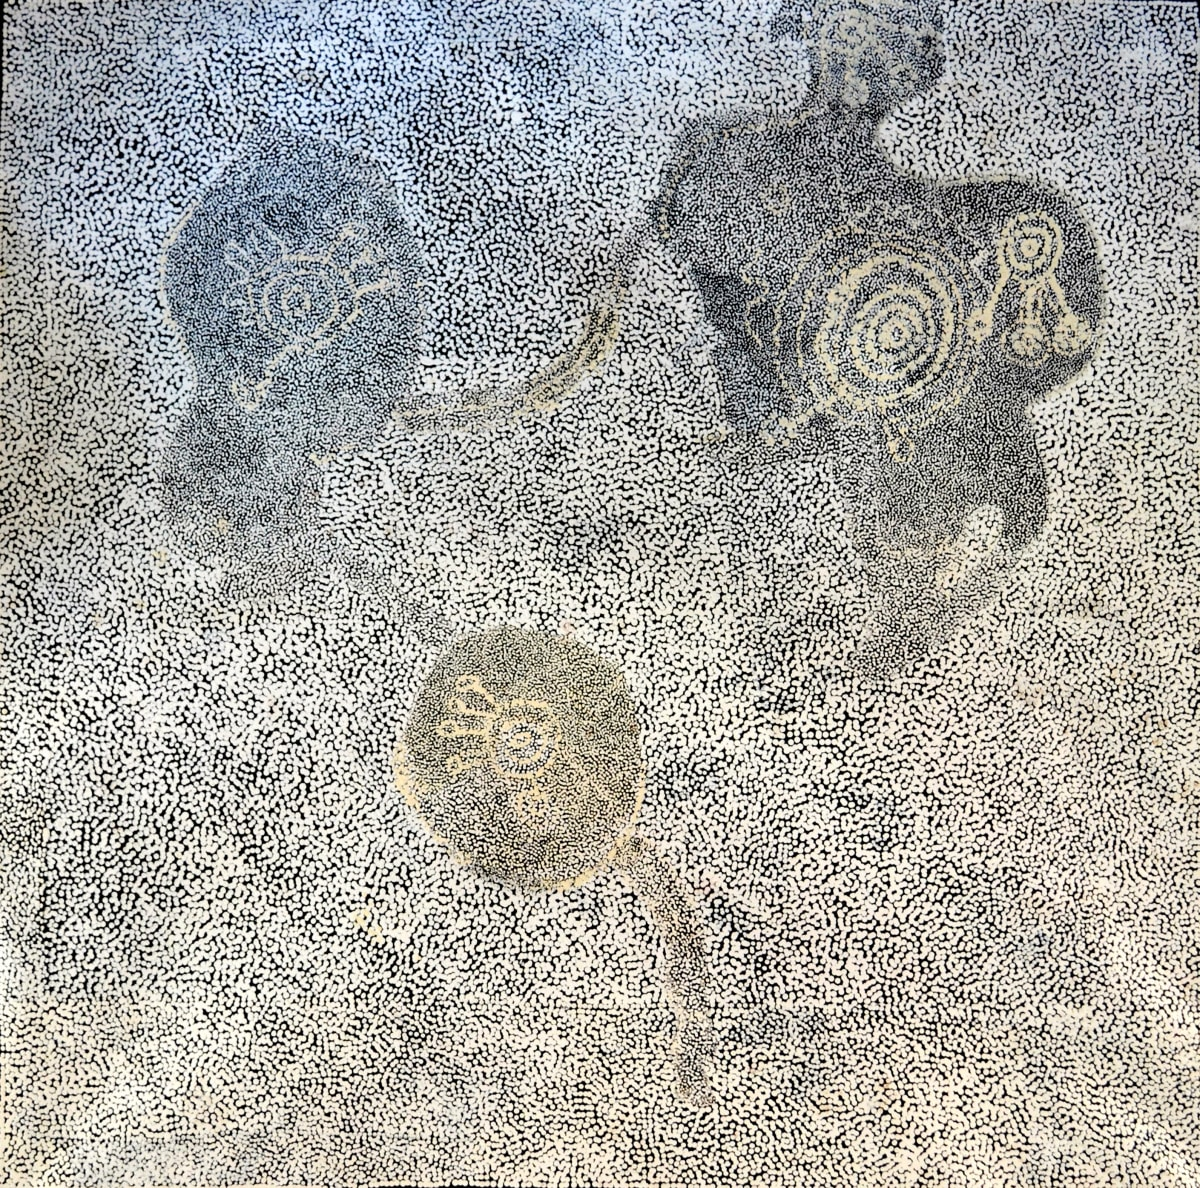 Matjangka (Nyukana) Norris Ngura Pilti - Dry Country acrylic on linen 153 x 153 cm